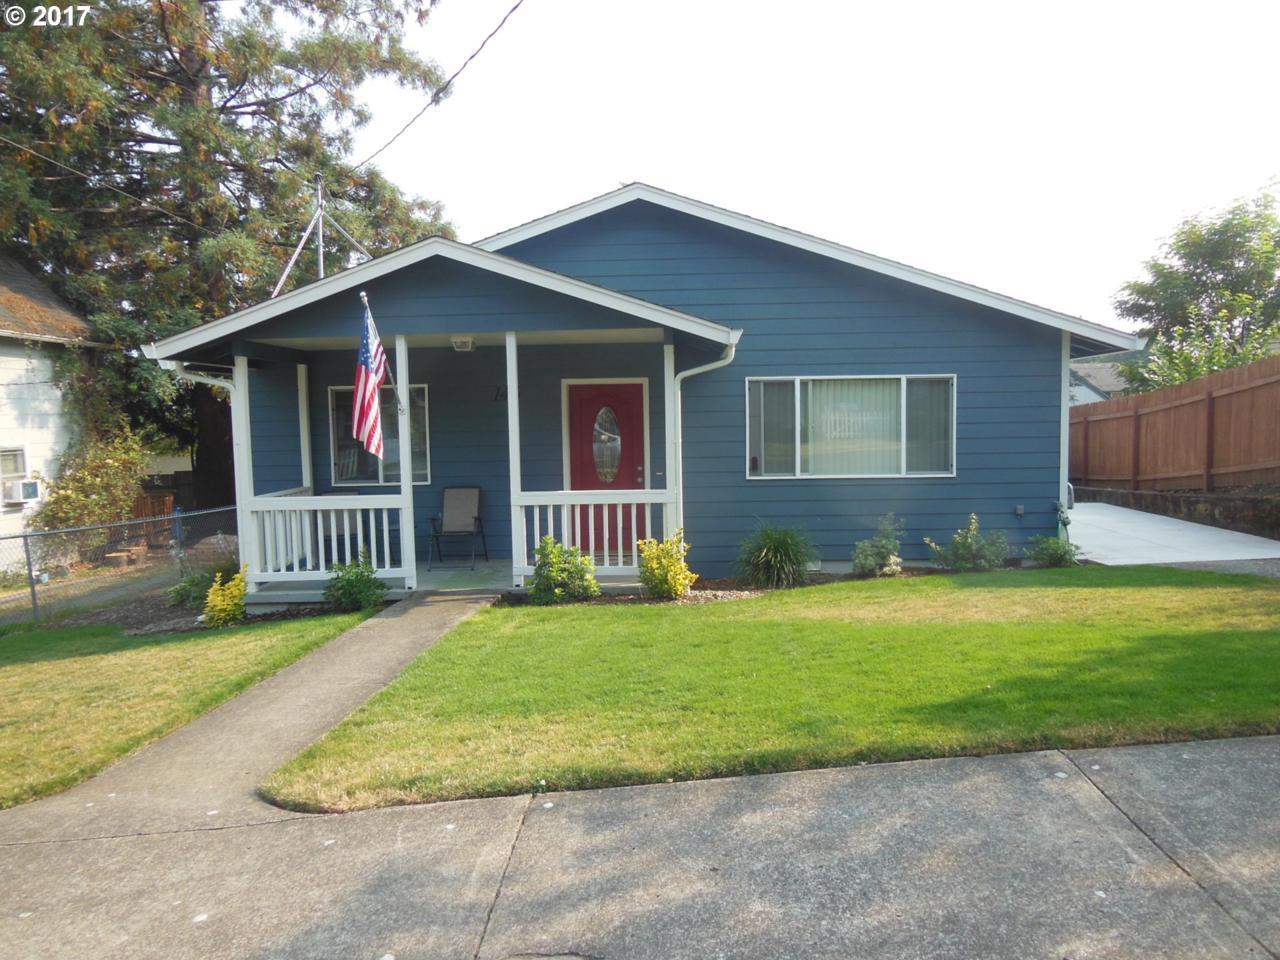 146 NW 17TH Ave, Camas, WA 98607 (MLS #17474287) :: The Dale Chumbley Group